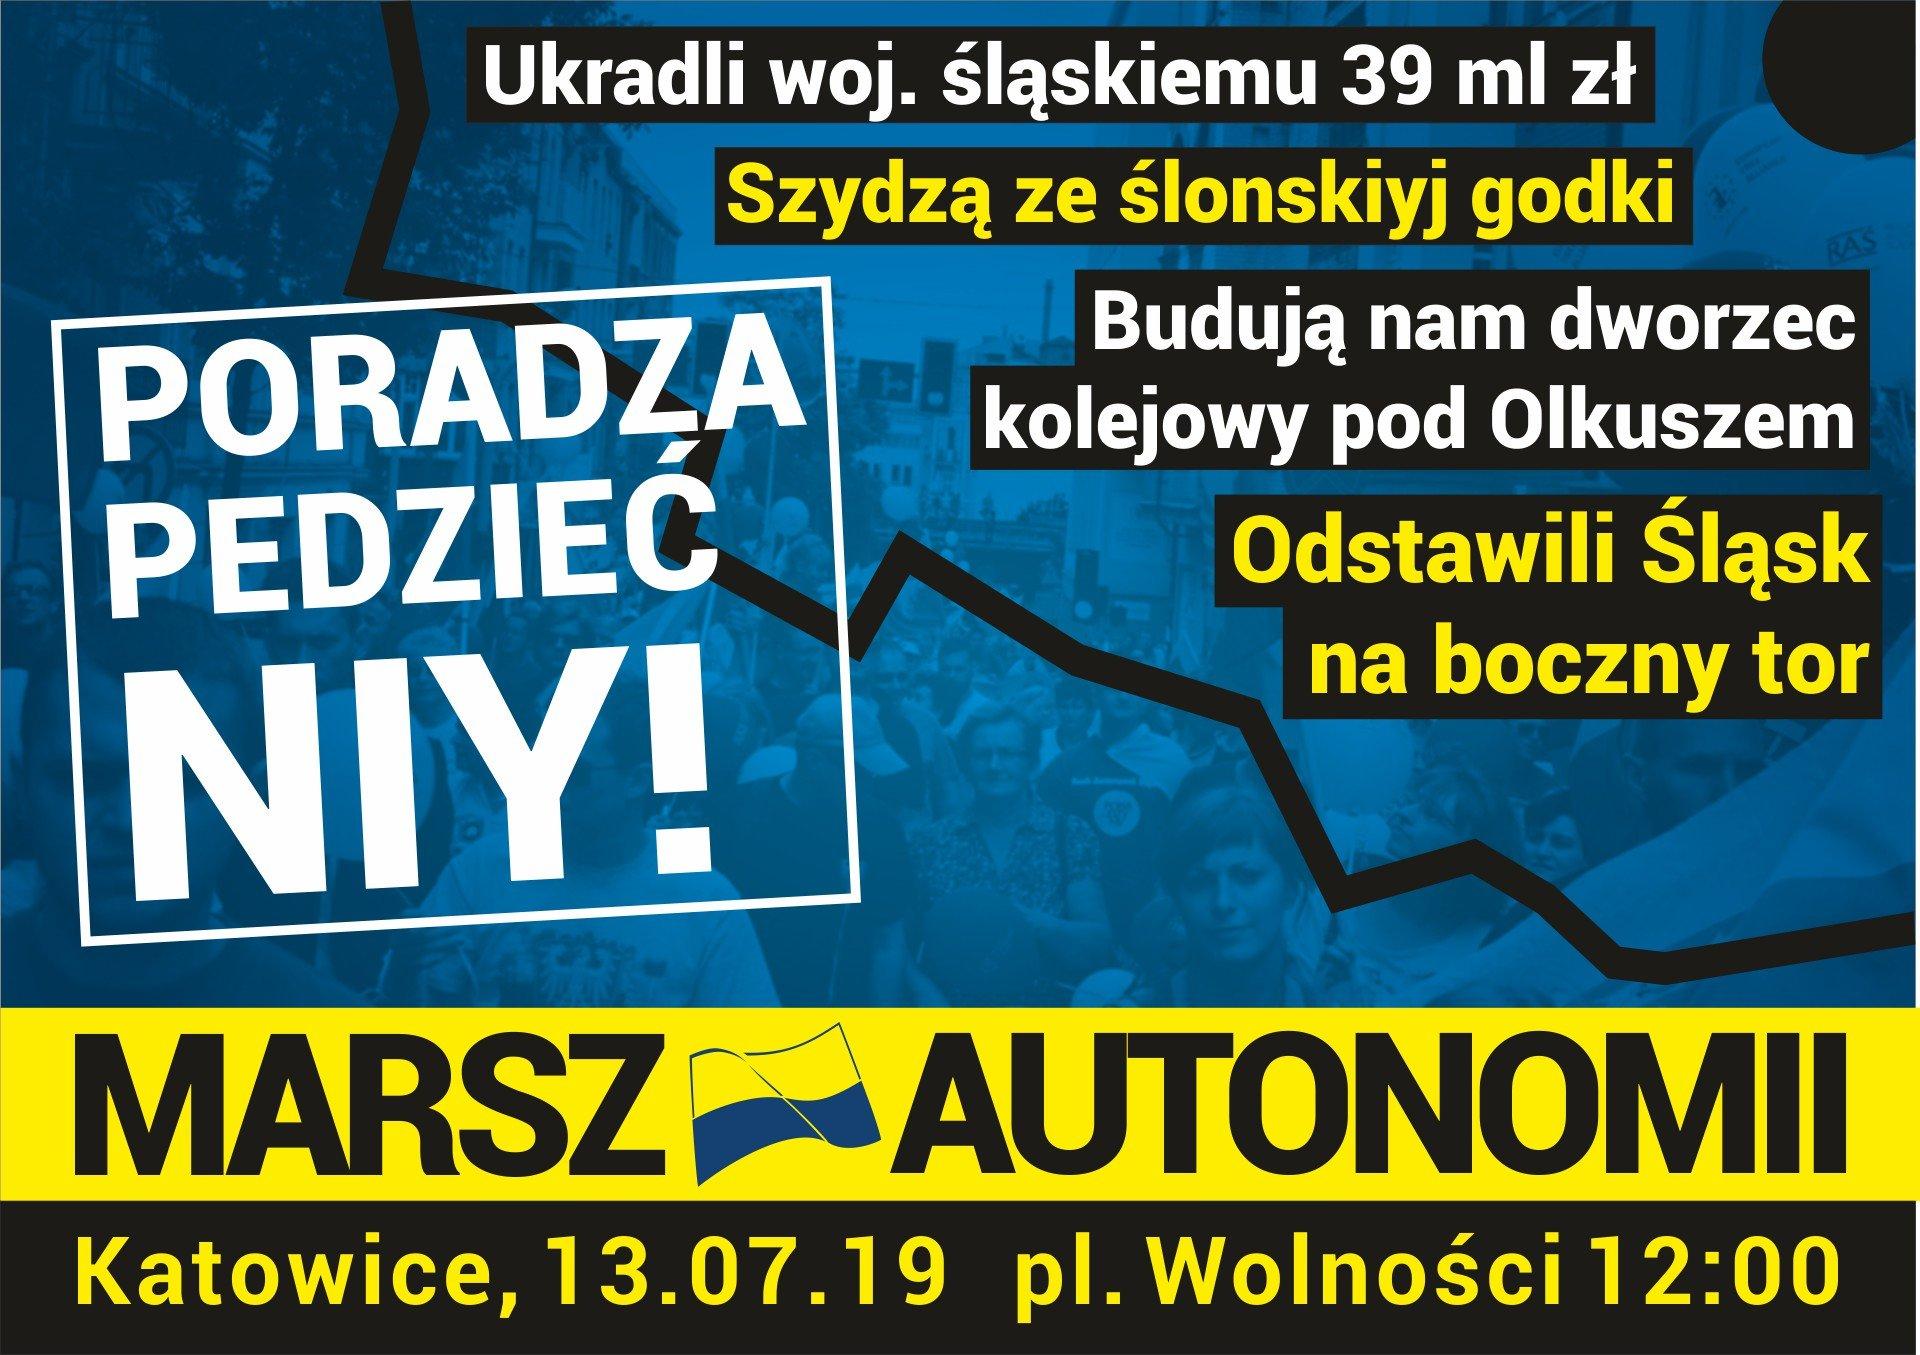 Oficjalny plakat 13. Marszu Autonomii